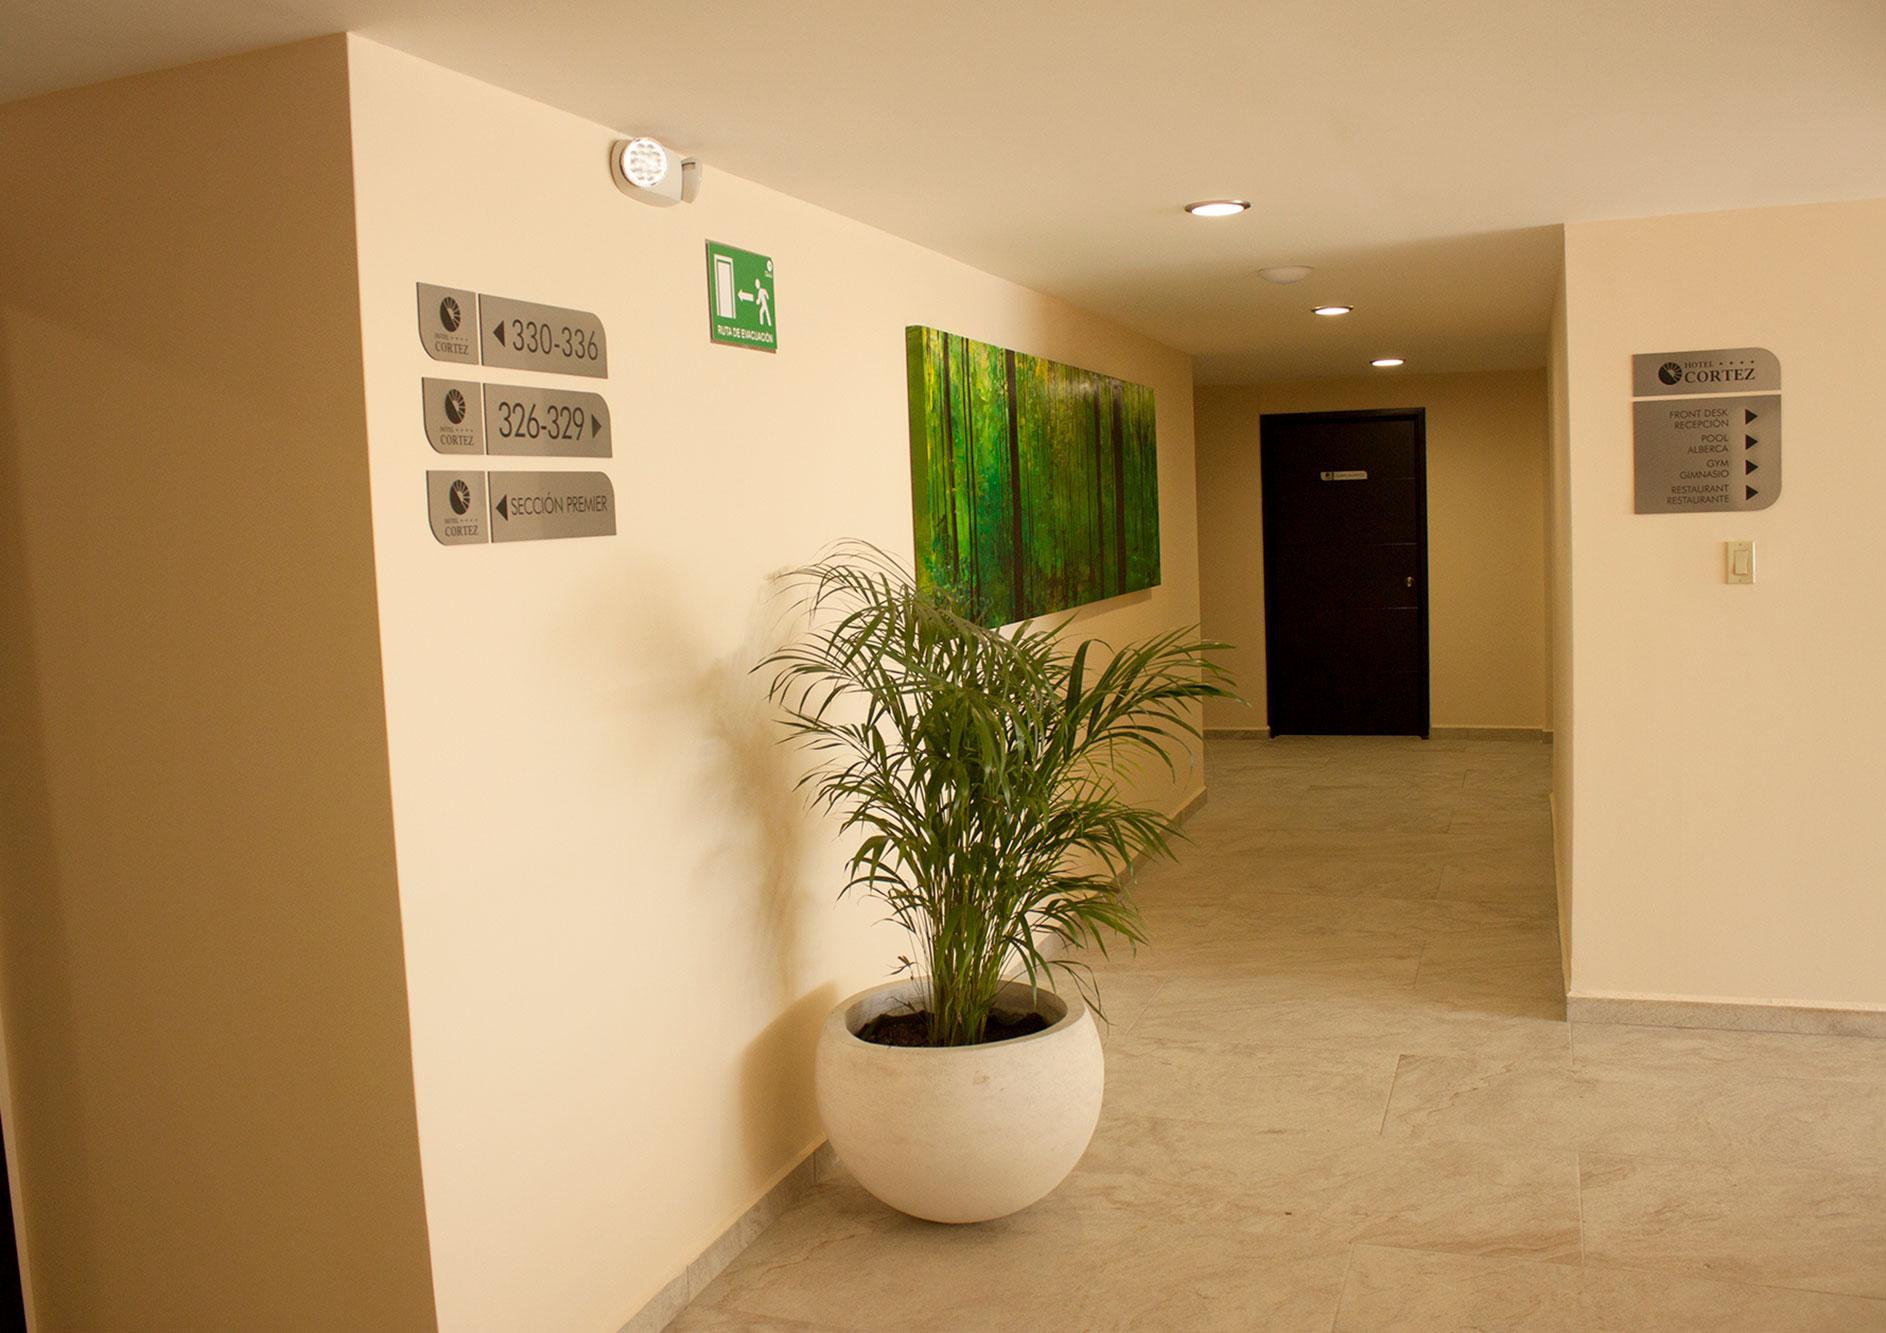 pasillo habitacion bosque hotel cortez